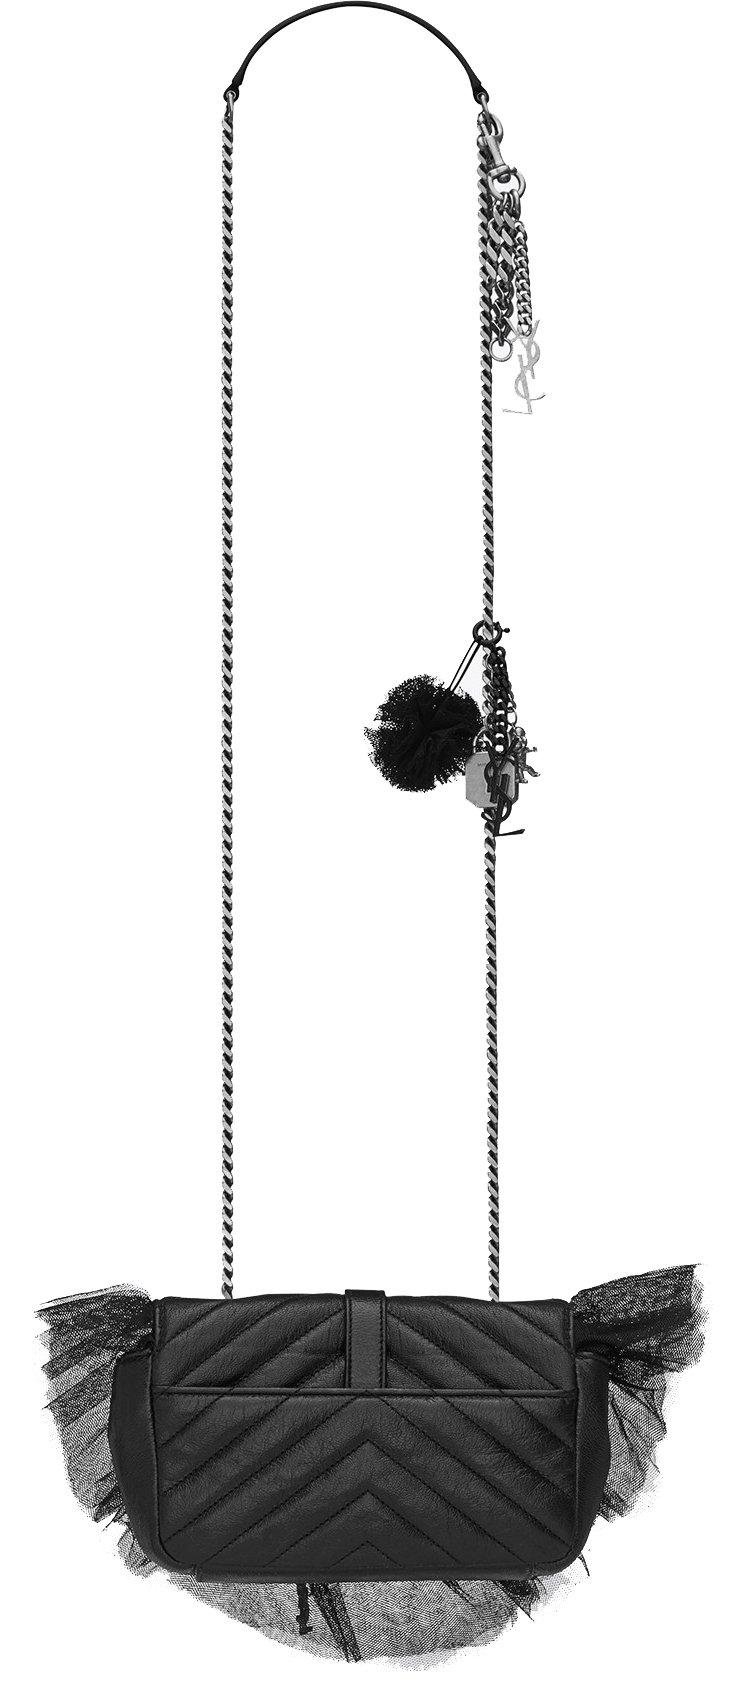 Saint-Laurent-Classic-Baby-Monogram-Punk-Chain-Bag-2